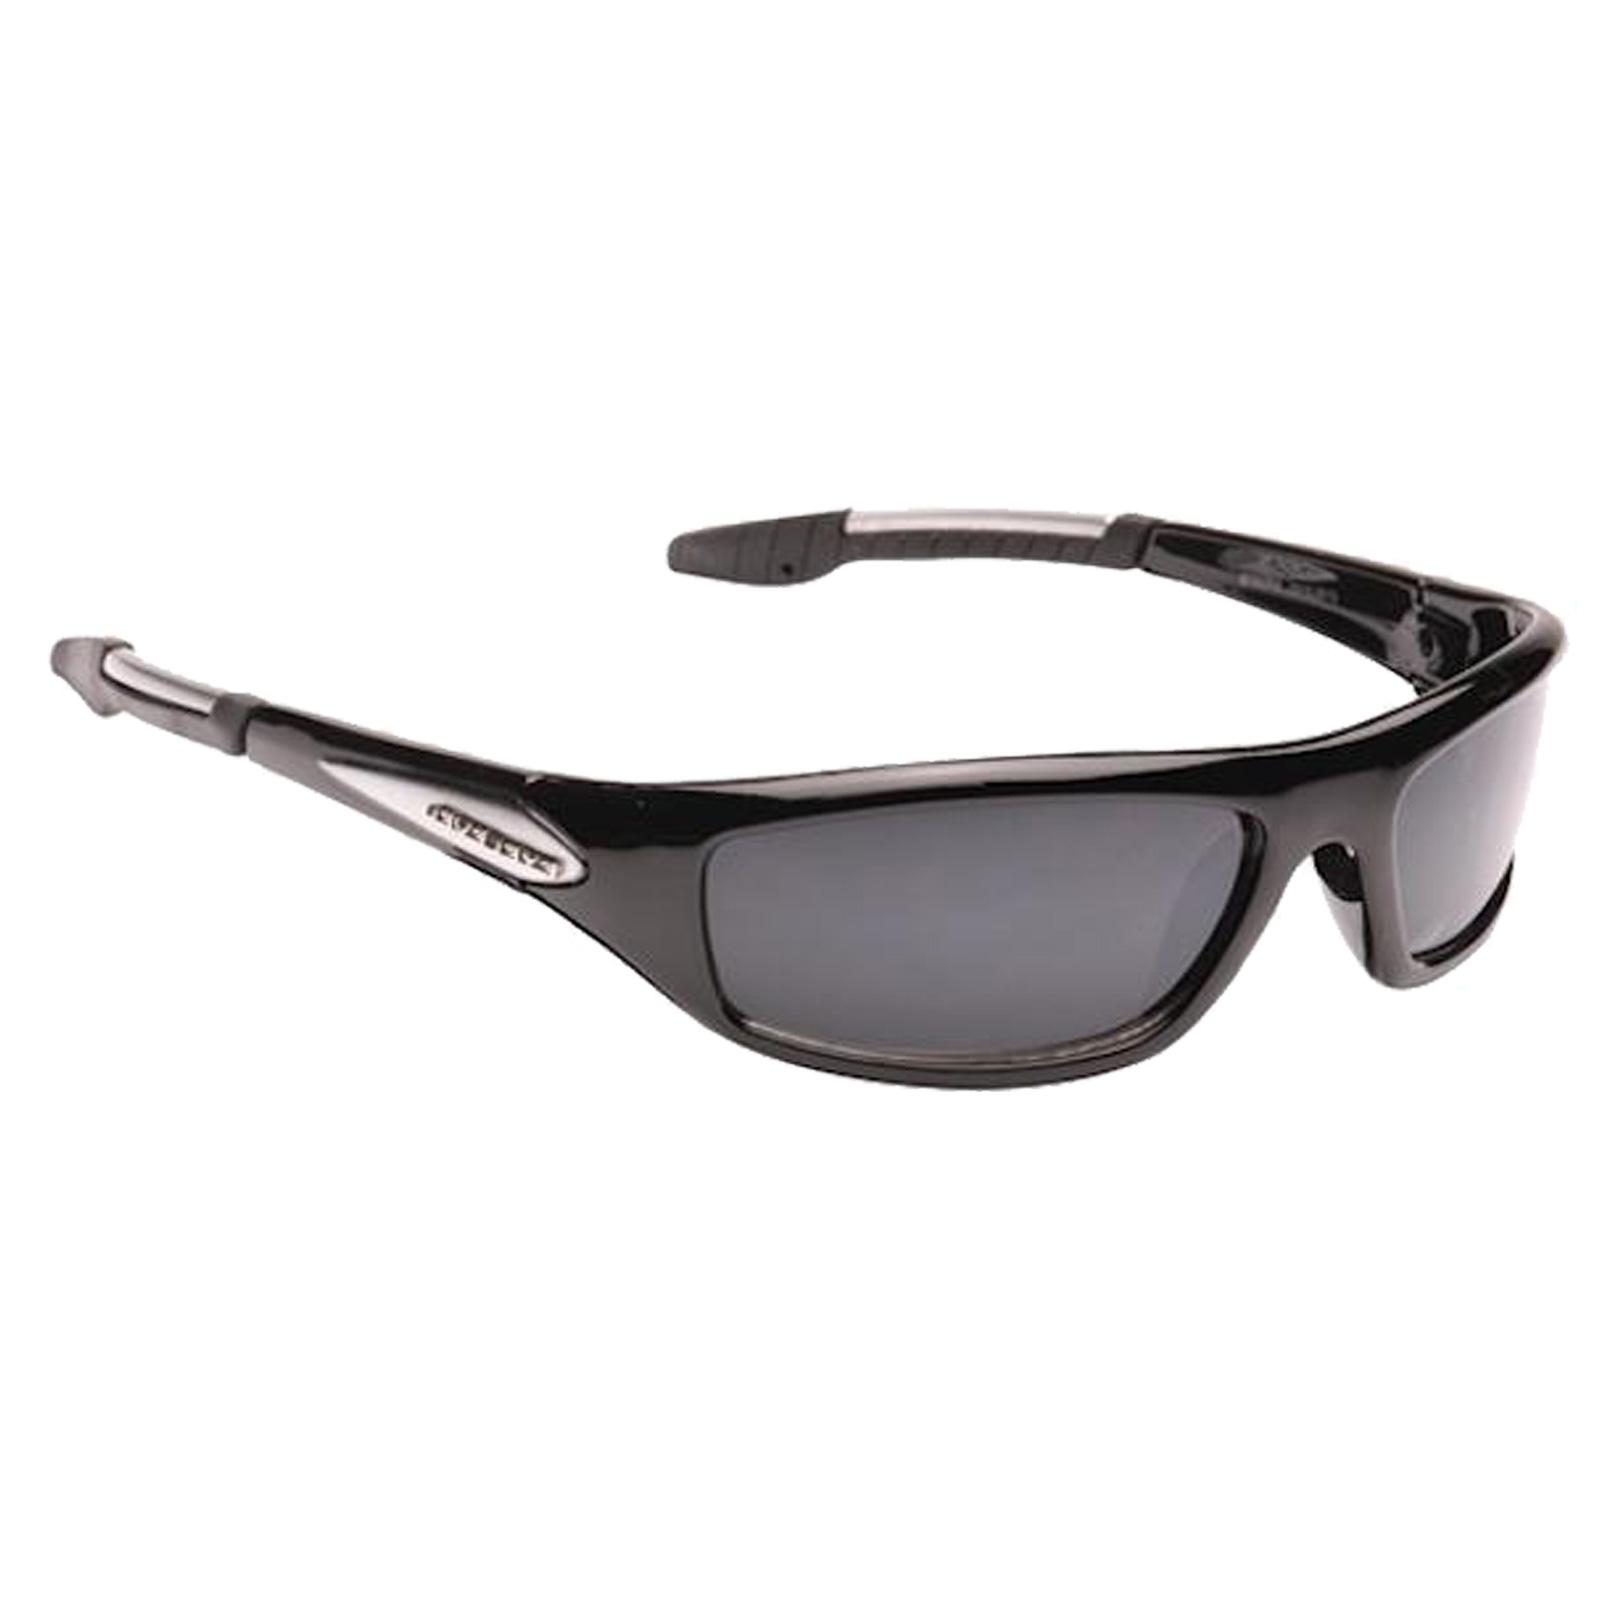 Eyelevel Mens Canyon Sunglasses UV400 UVA UVB Protection Anti Glare Lens